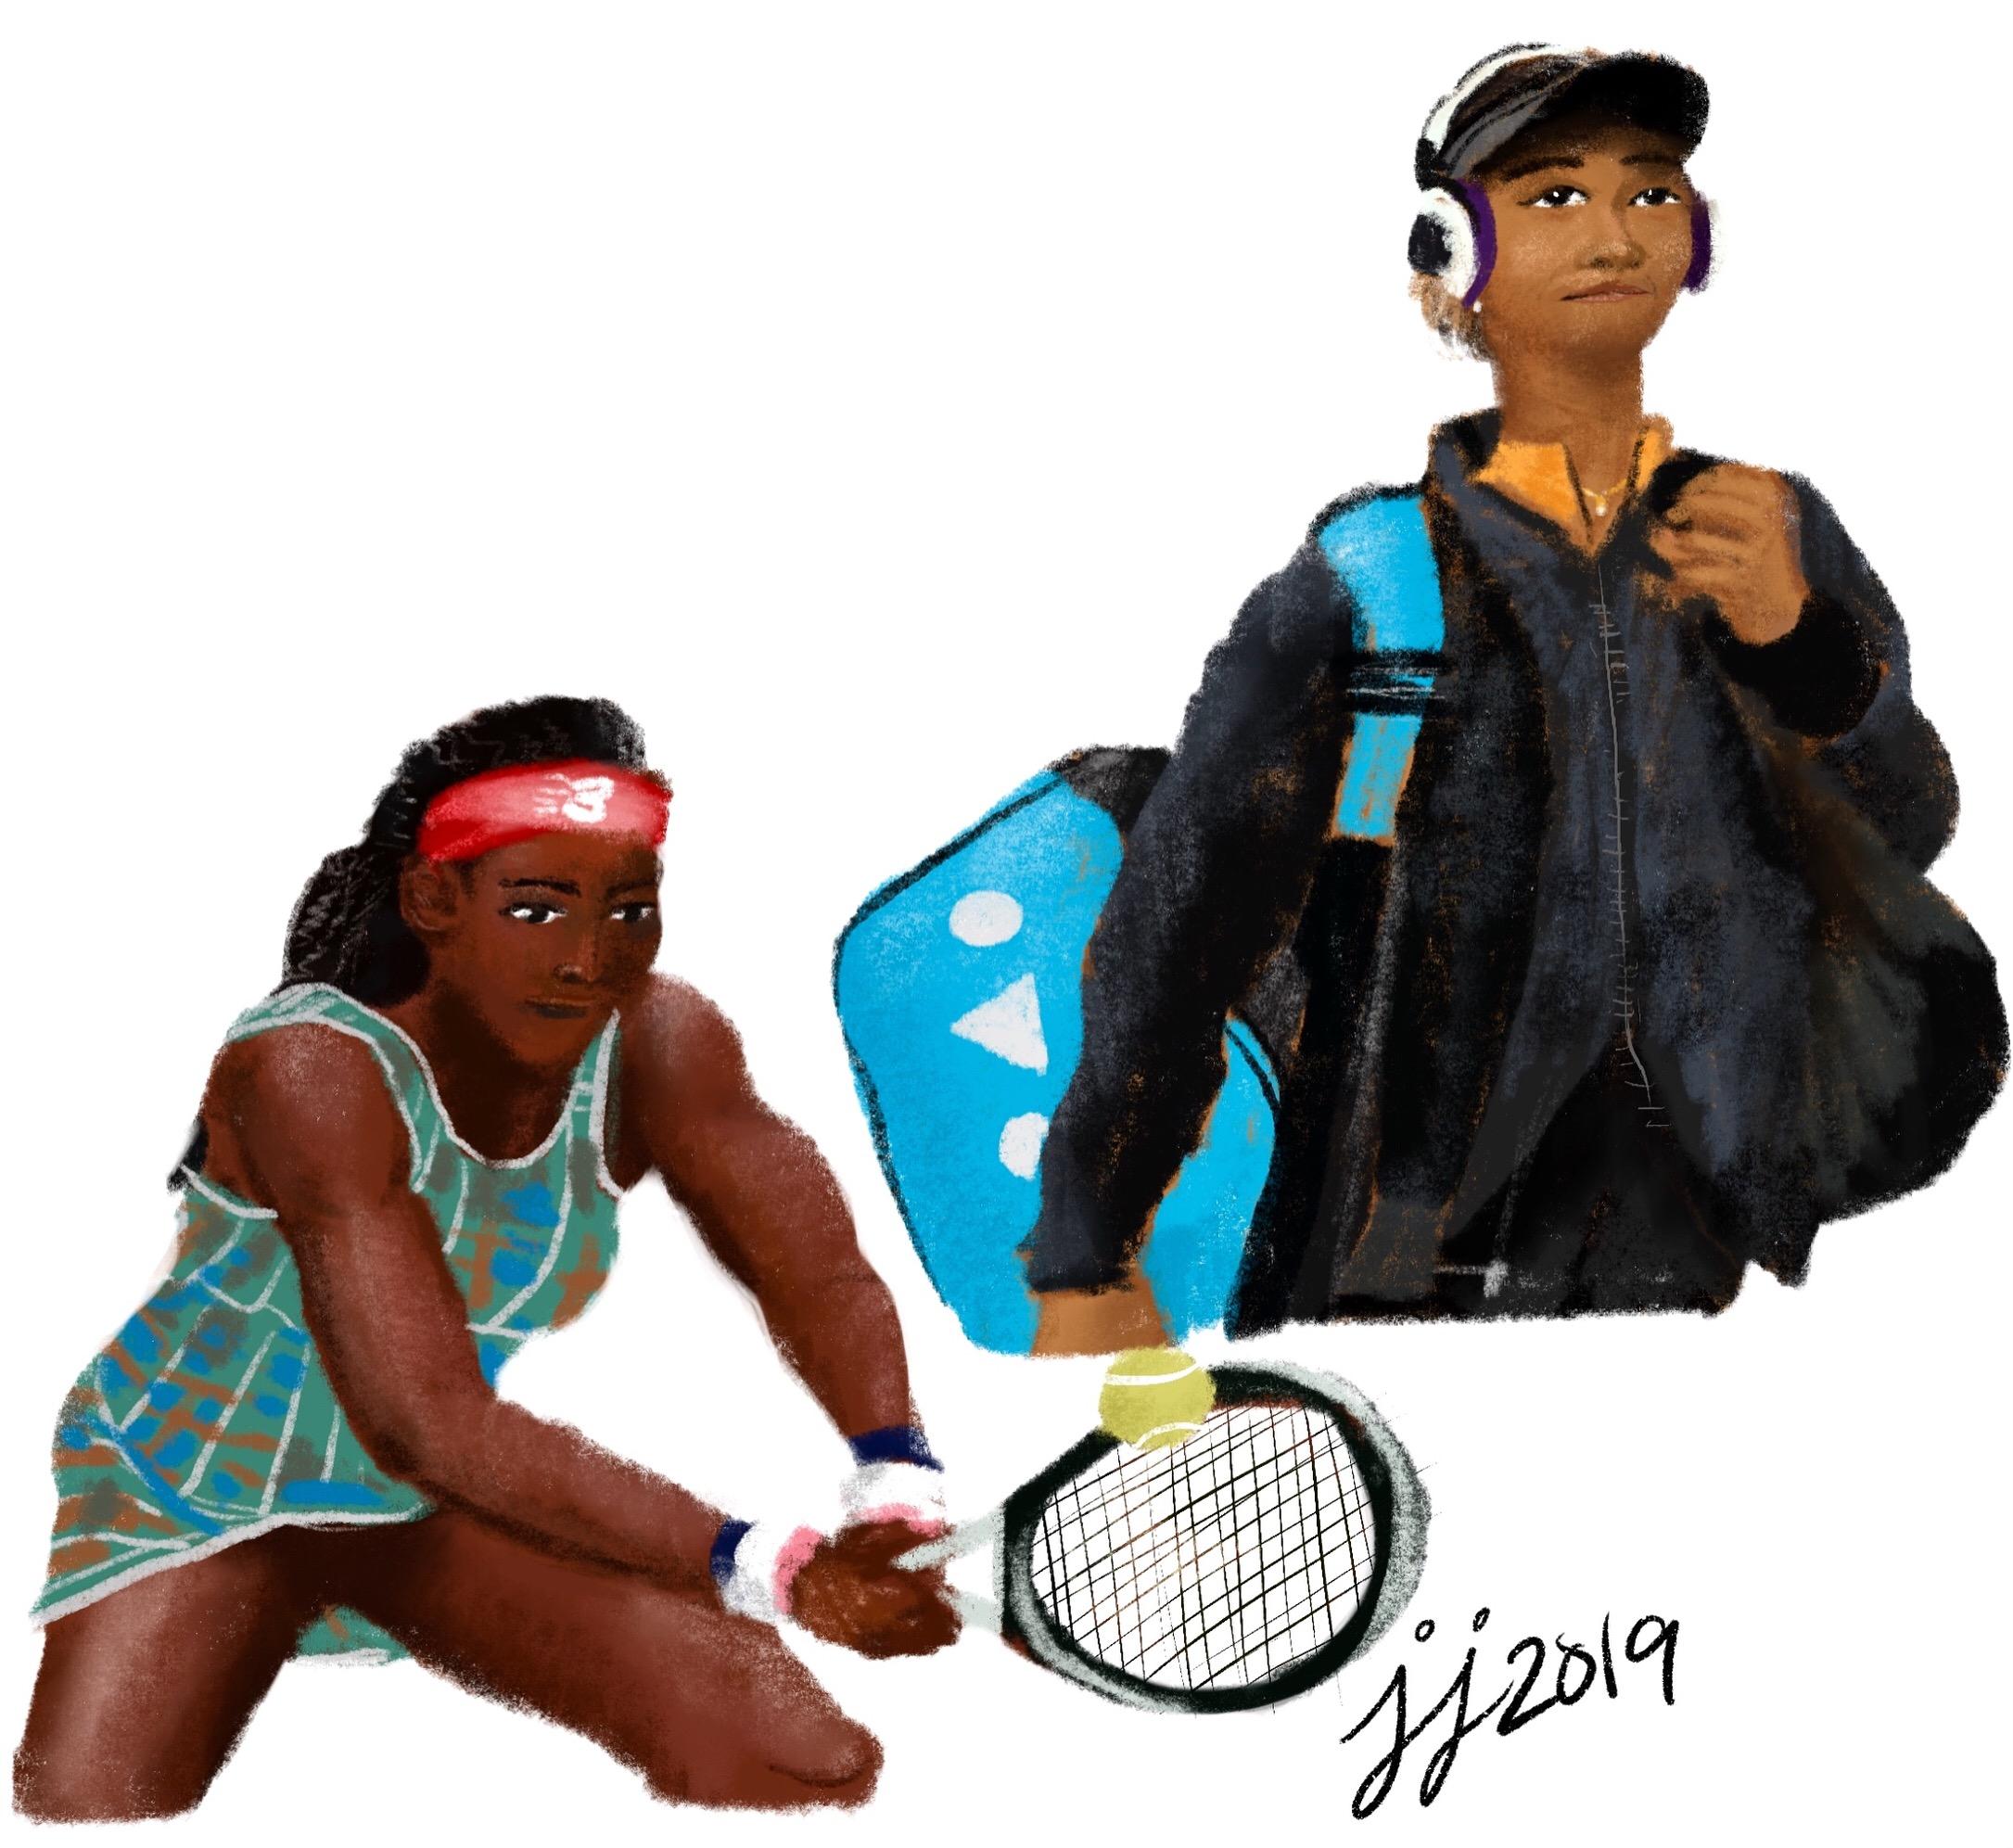 CocoGauff&NaomiOsaka(Tennis).jpg